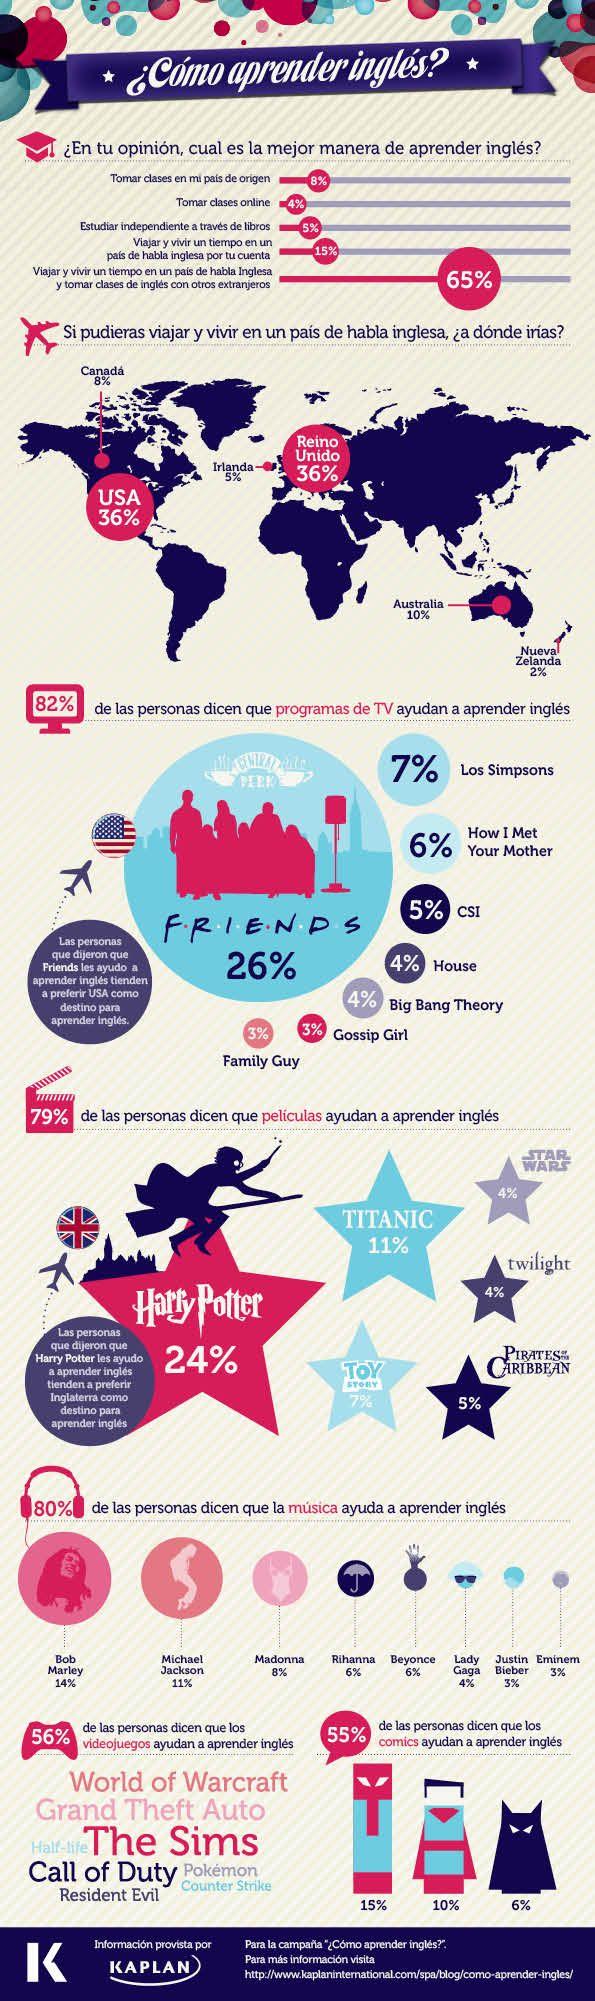 Aprende inglés: cómo aprender inglés #infografia #infographic #education